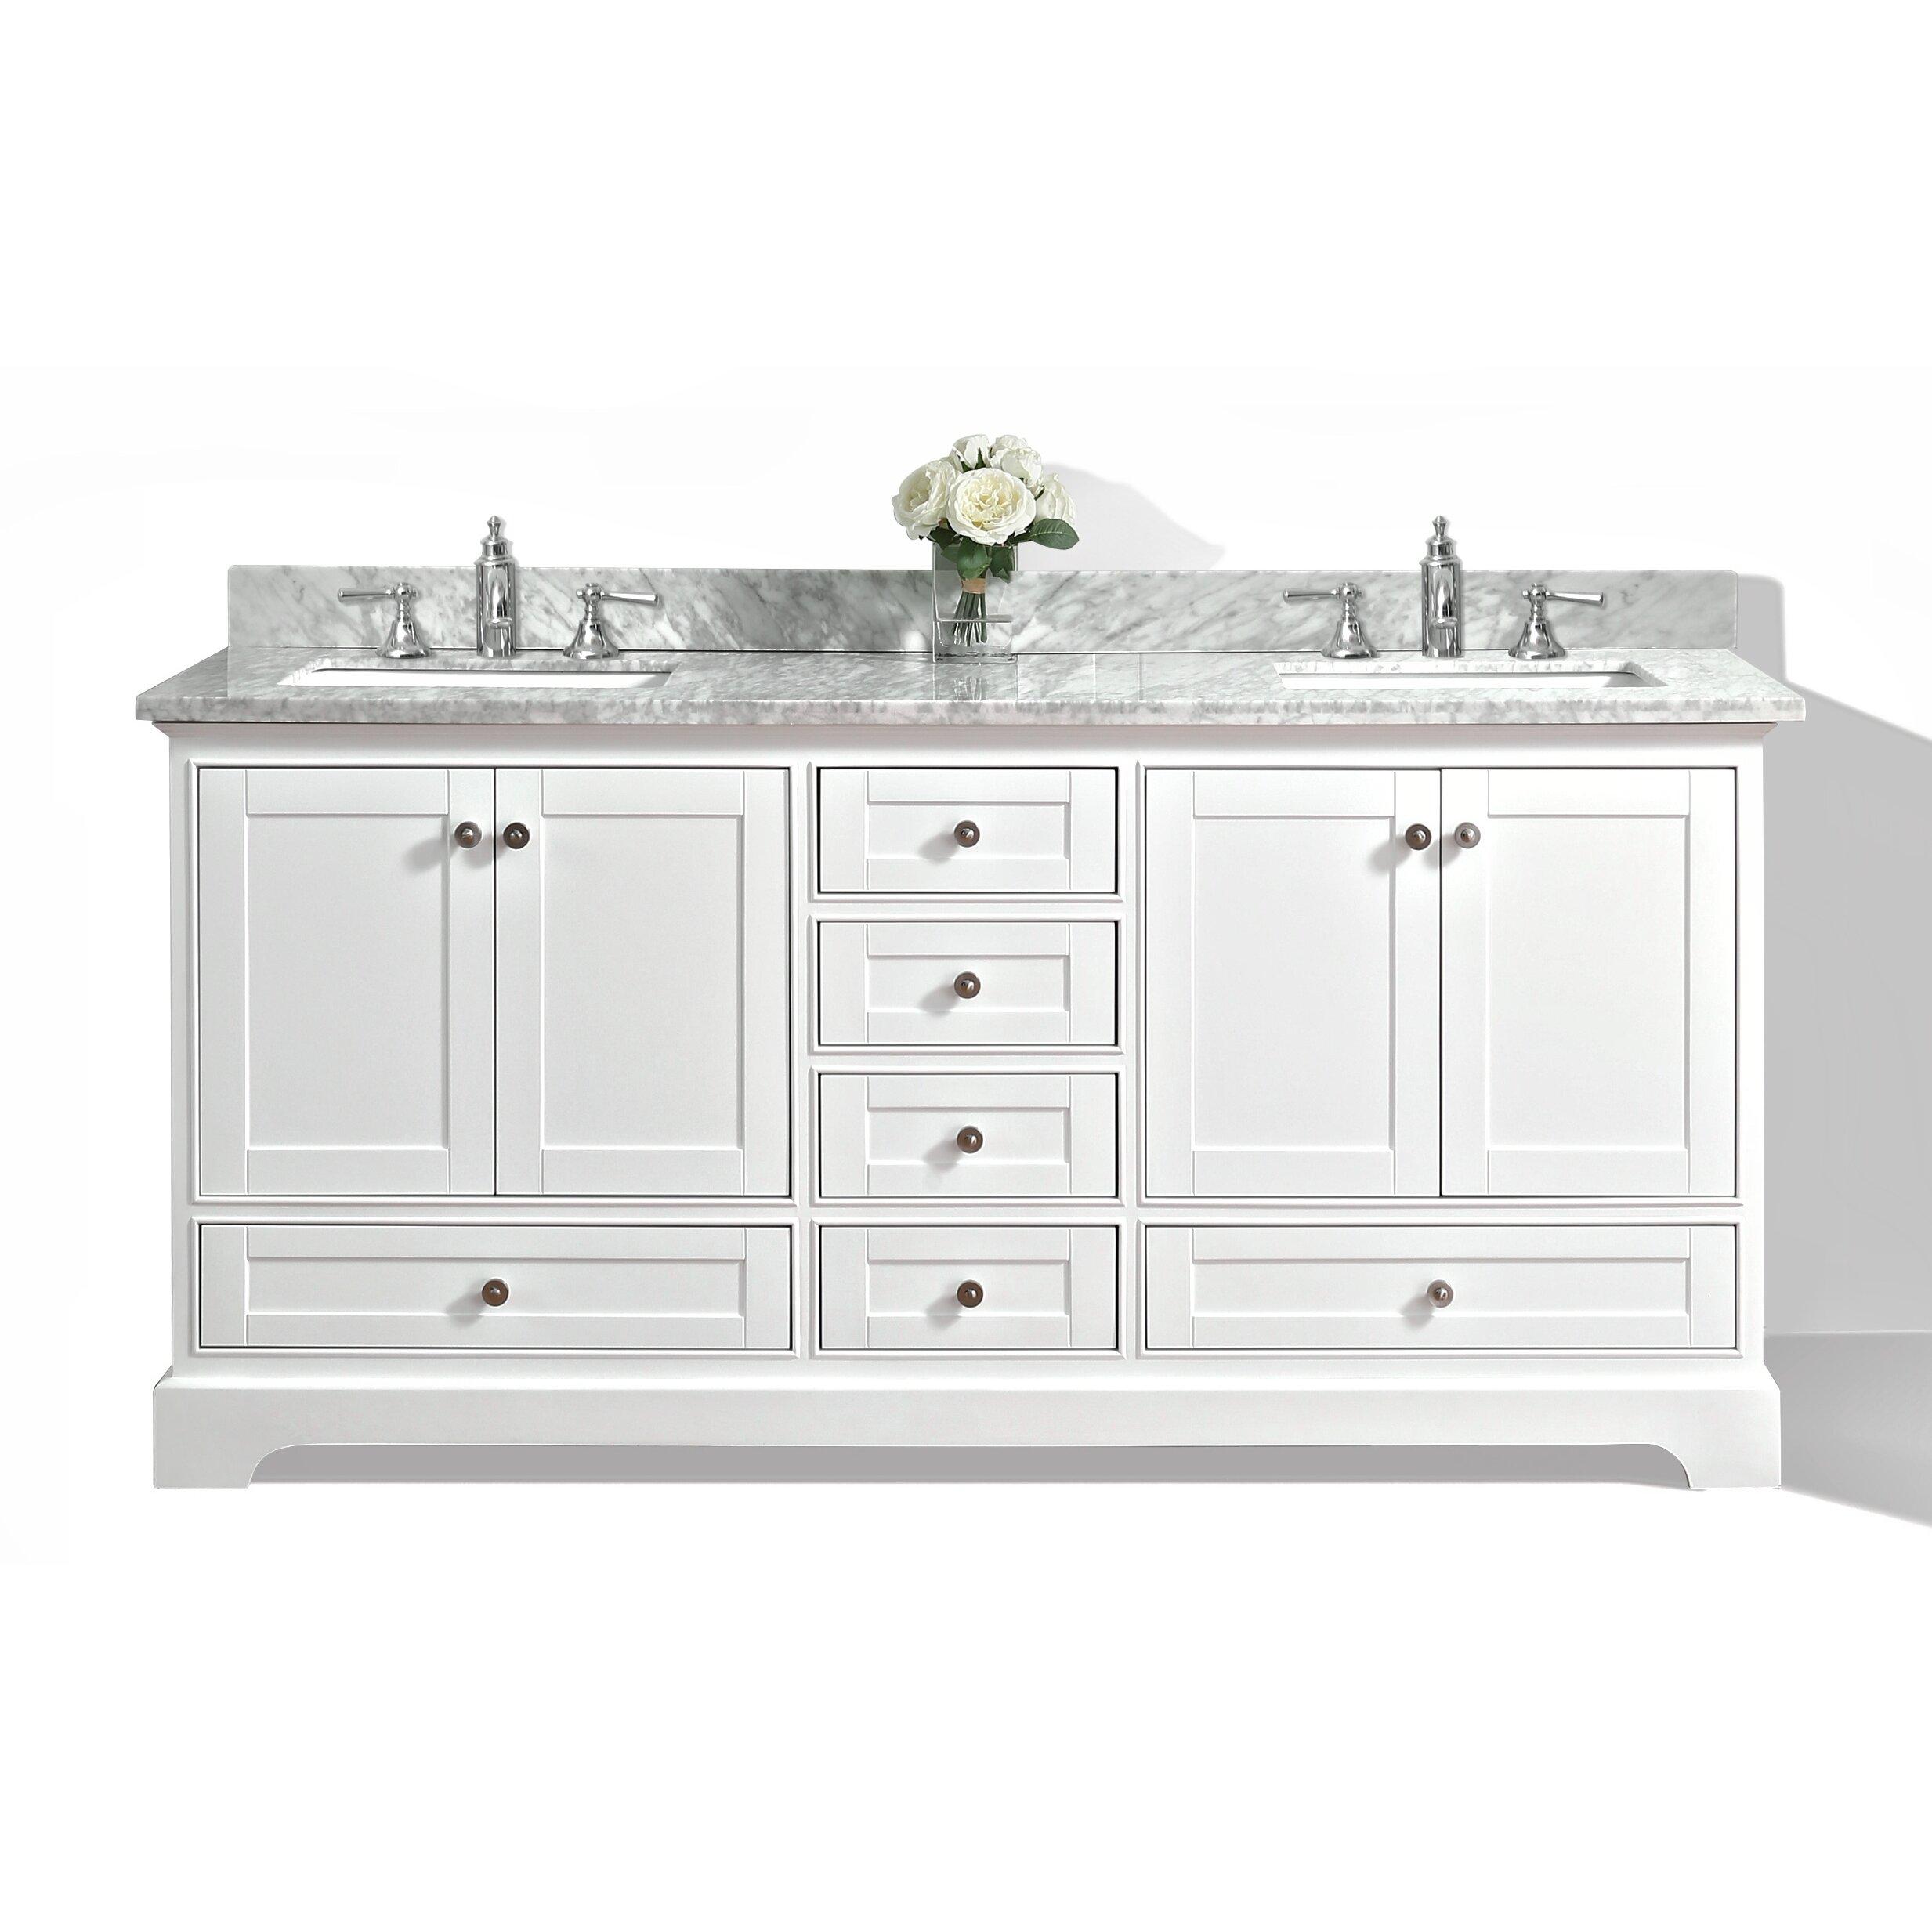 Ancerre Designs Audrey 72 Bath Vanity Set With Italian Carrara White Marble Vanity Top